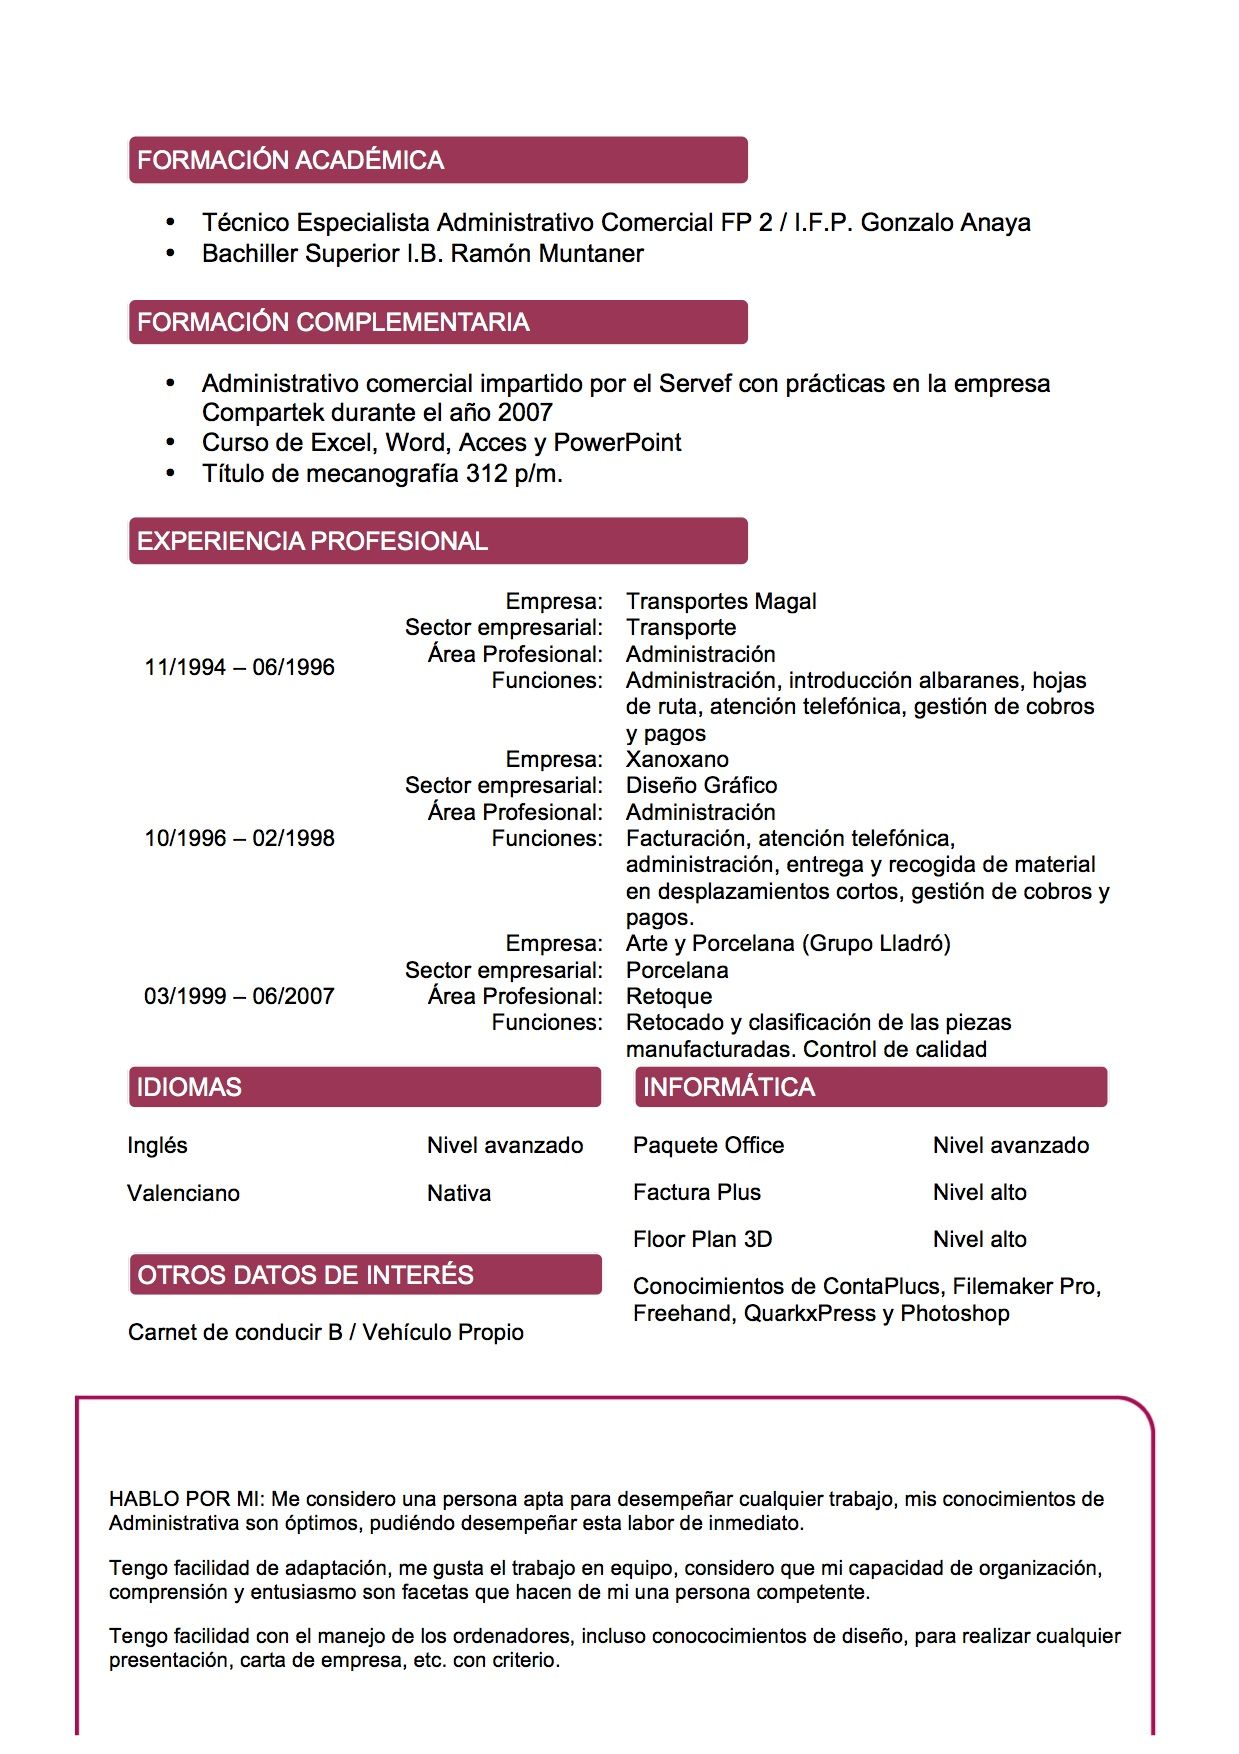 Currículum Vitae Modelo Vino Tienda De Curriculum | Cosas para ...